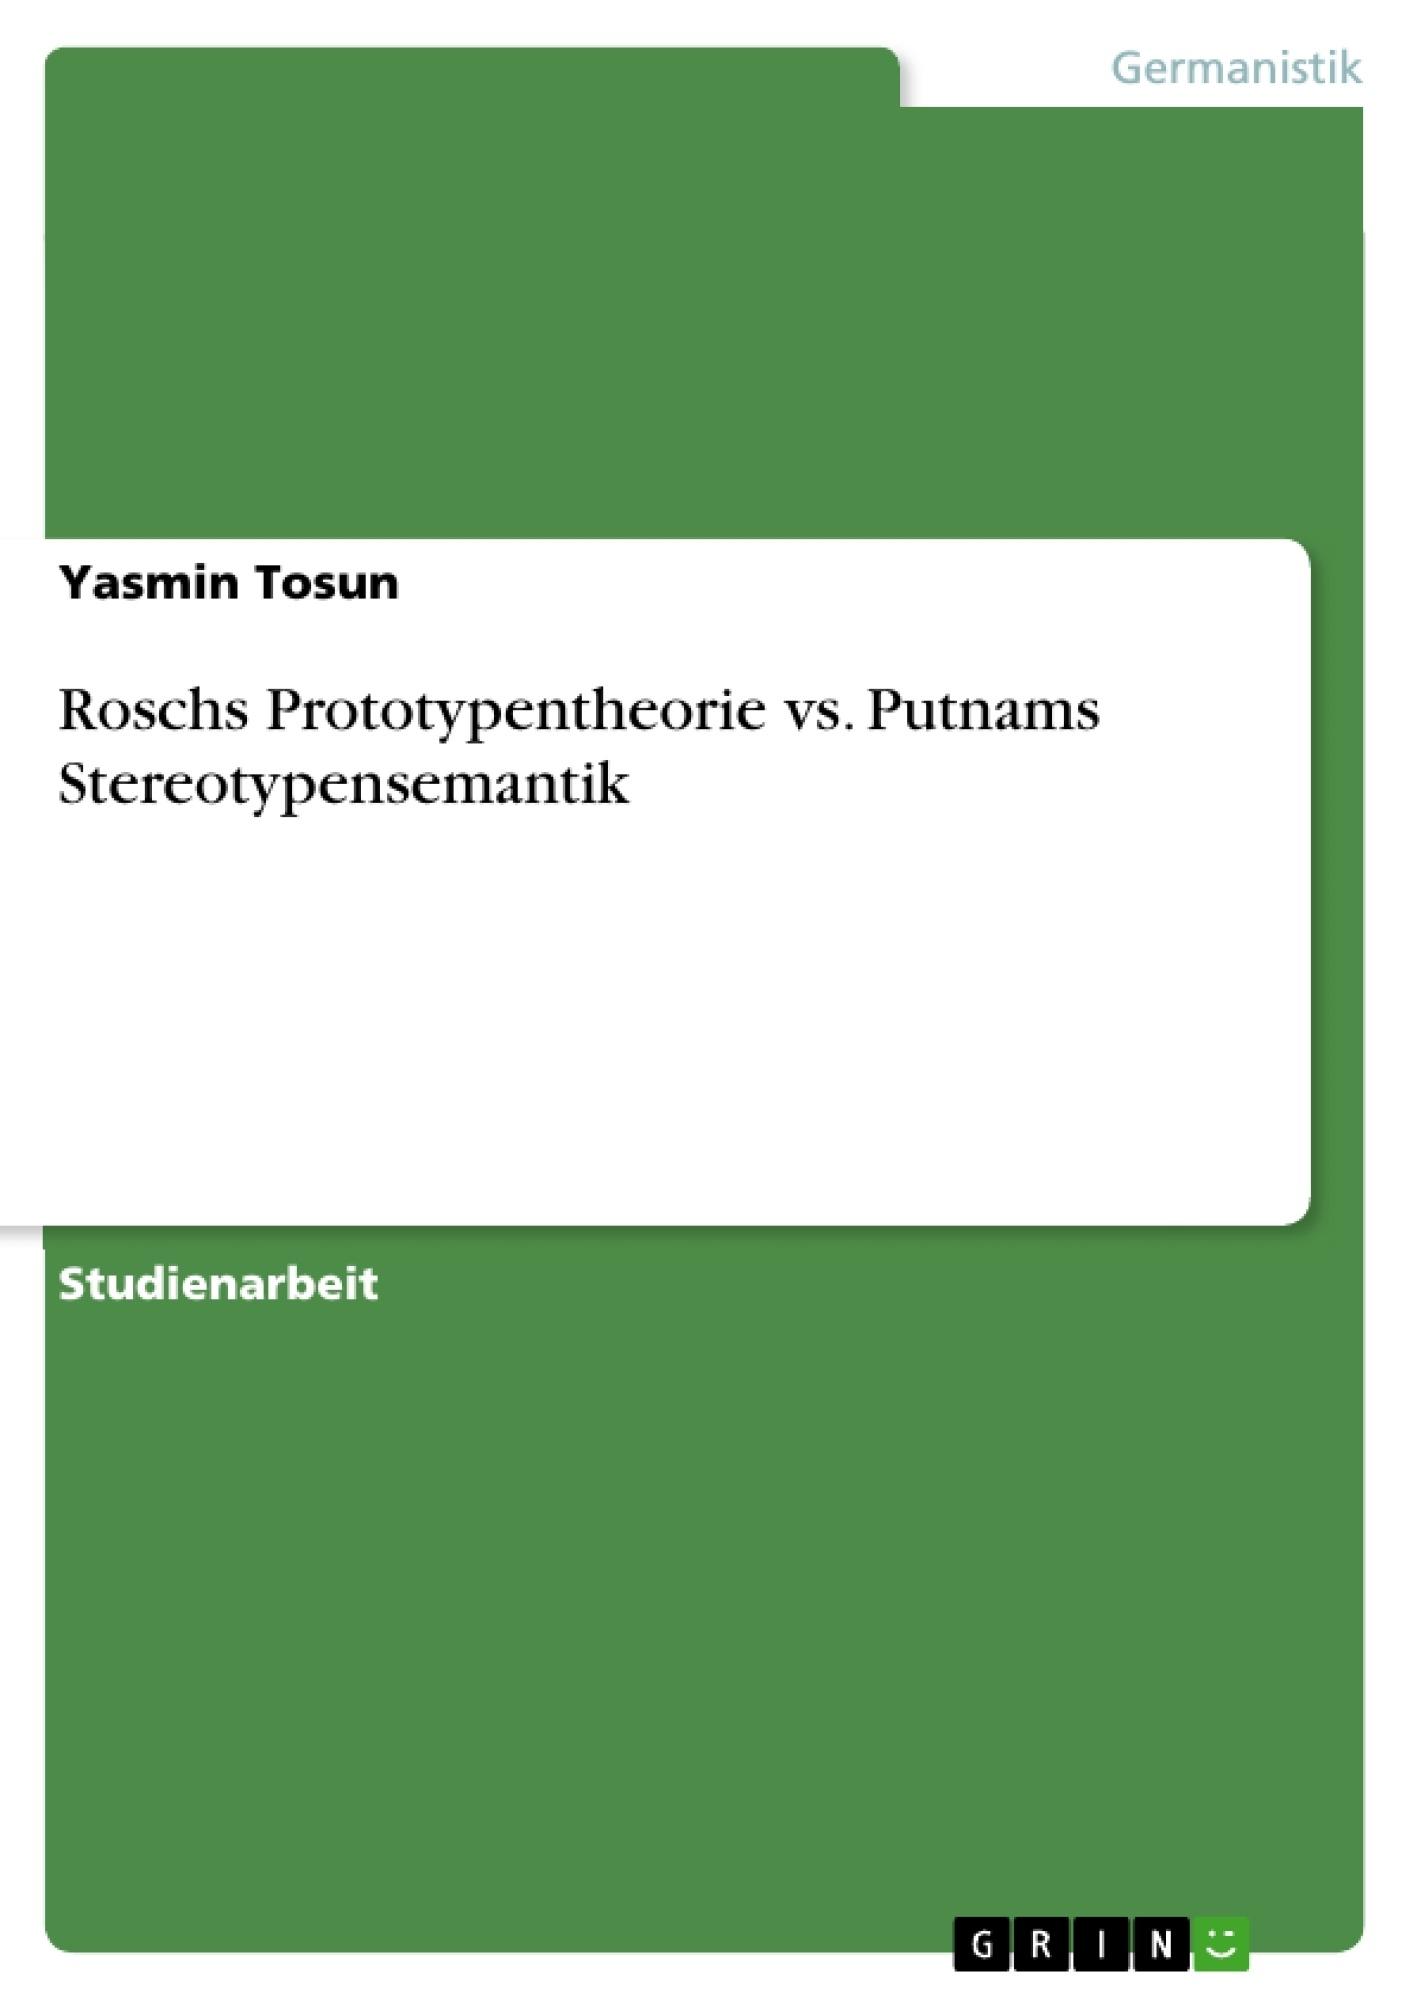 Titel: Roschs Prototypentheorie vs. Putnams Stereotypensemantik